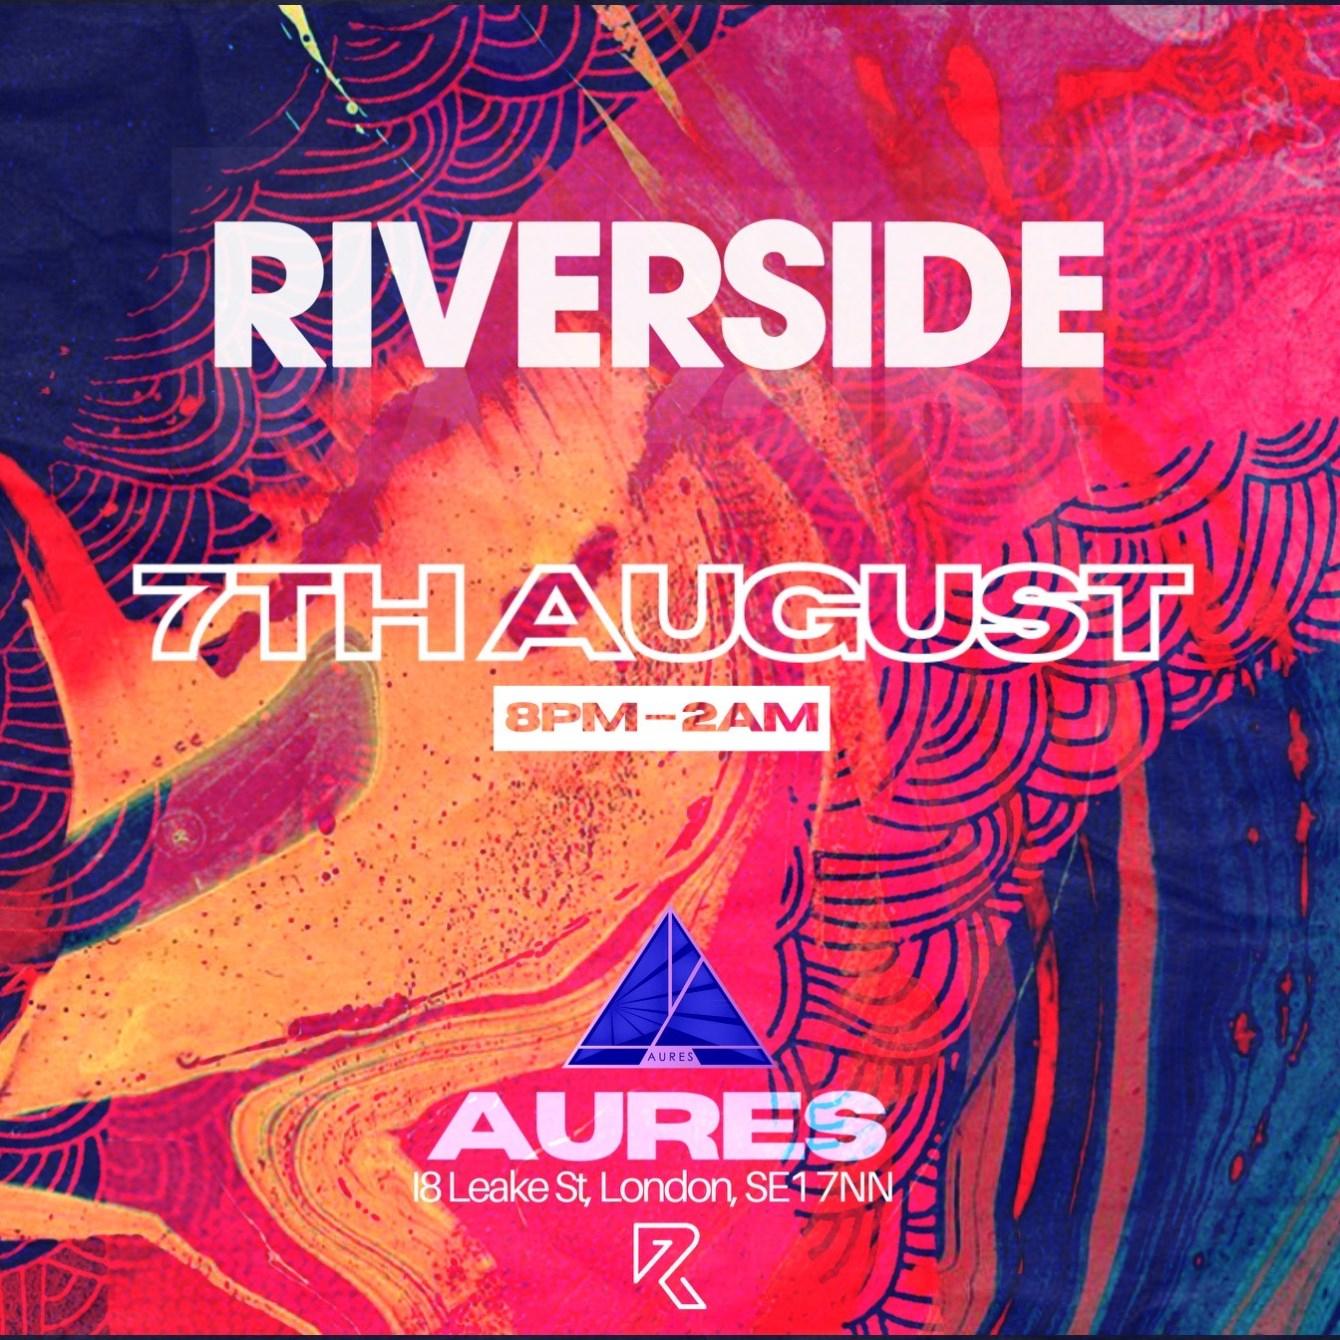 Riverside Aures London - Flyer front